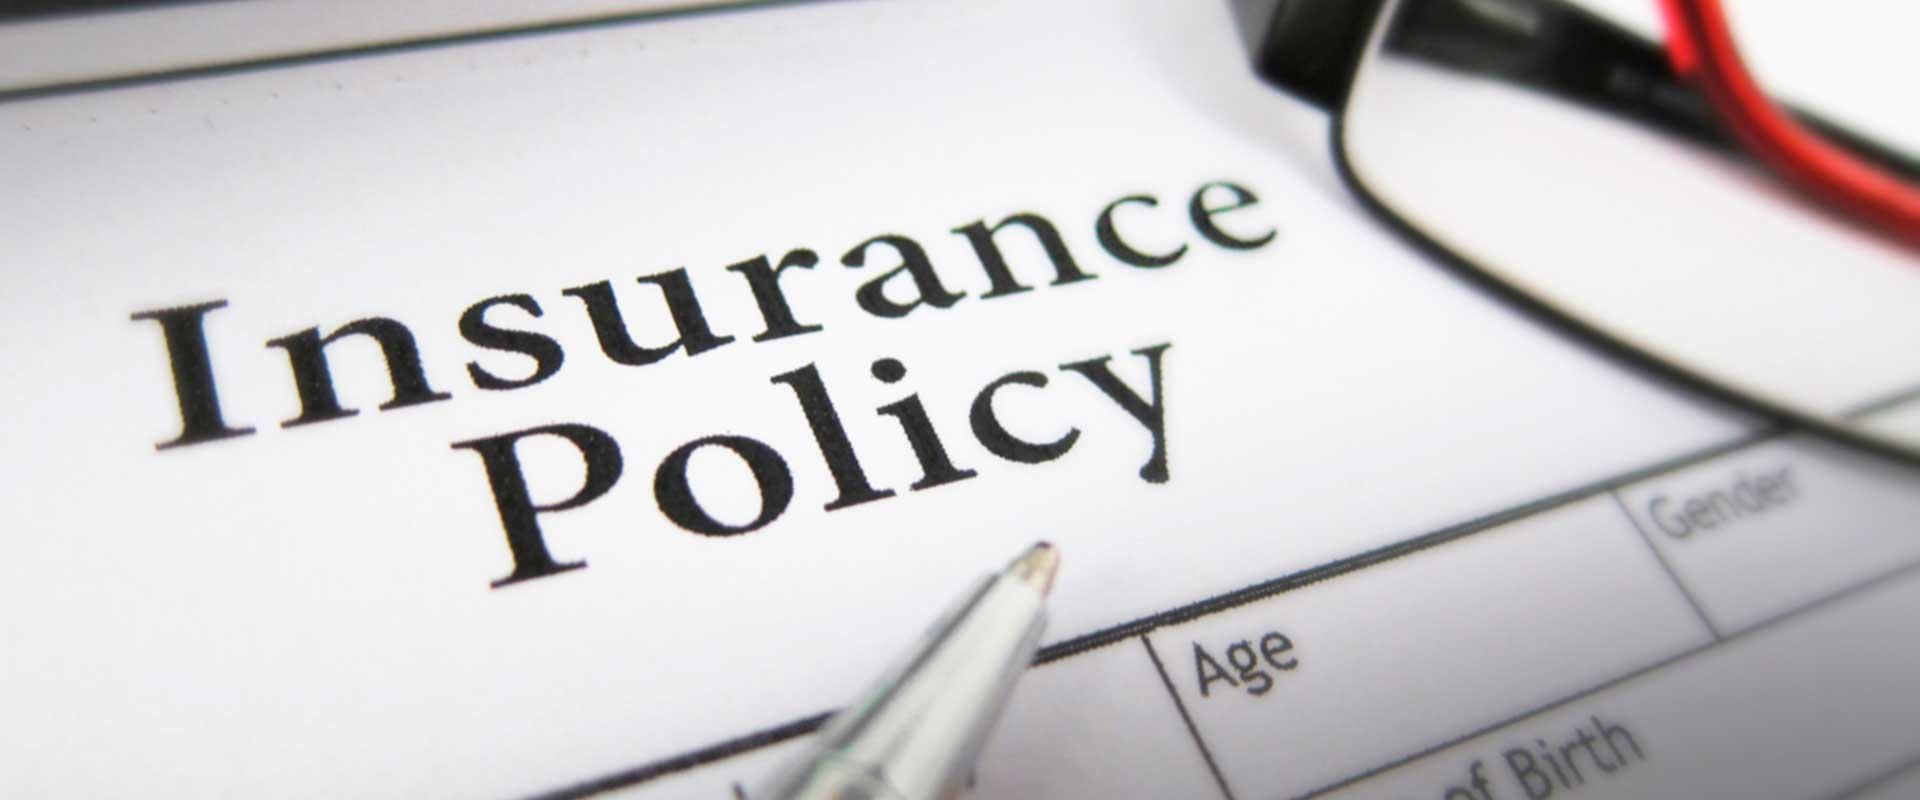 3_insurance1920x800